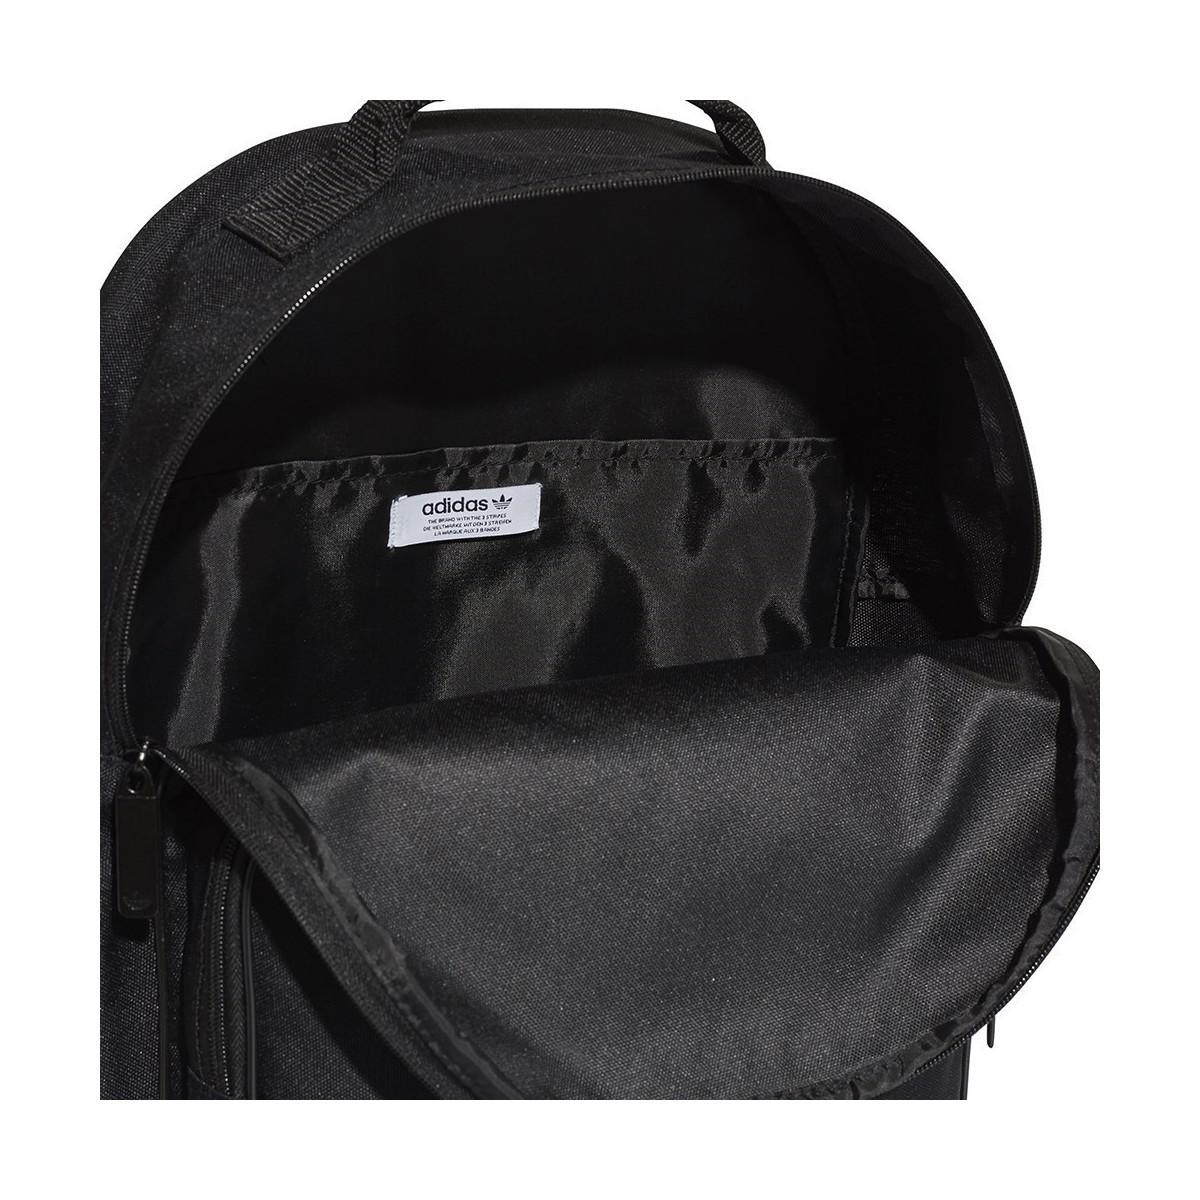 ... premium selection e0b7c bcc69 Adidas - Originals Trefoil Boyss  Childrens Backpack In Black for Men ... a0e3c93a21